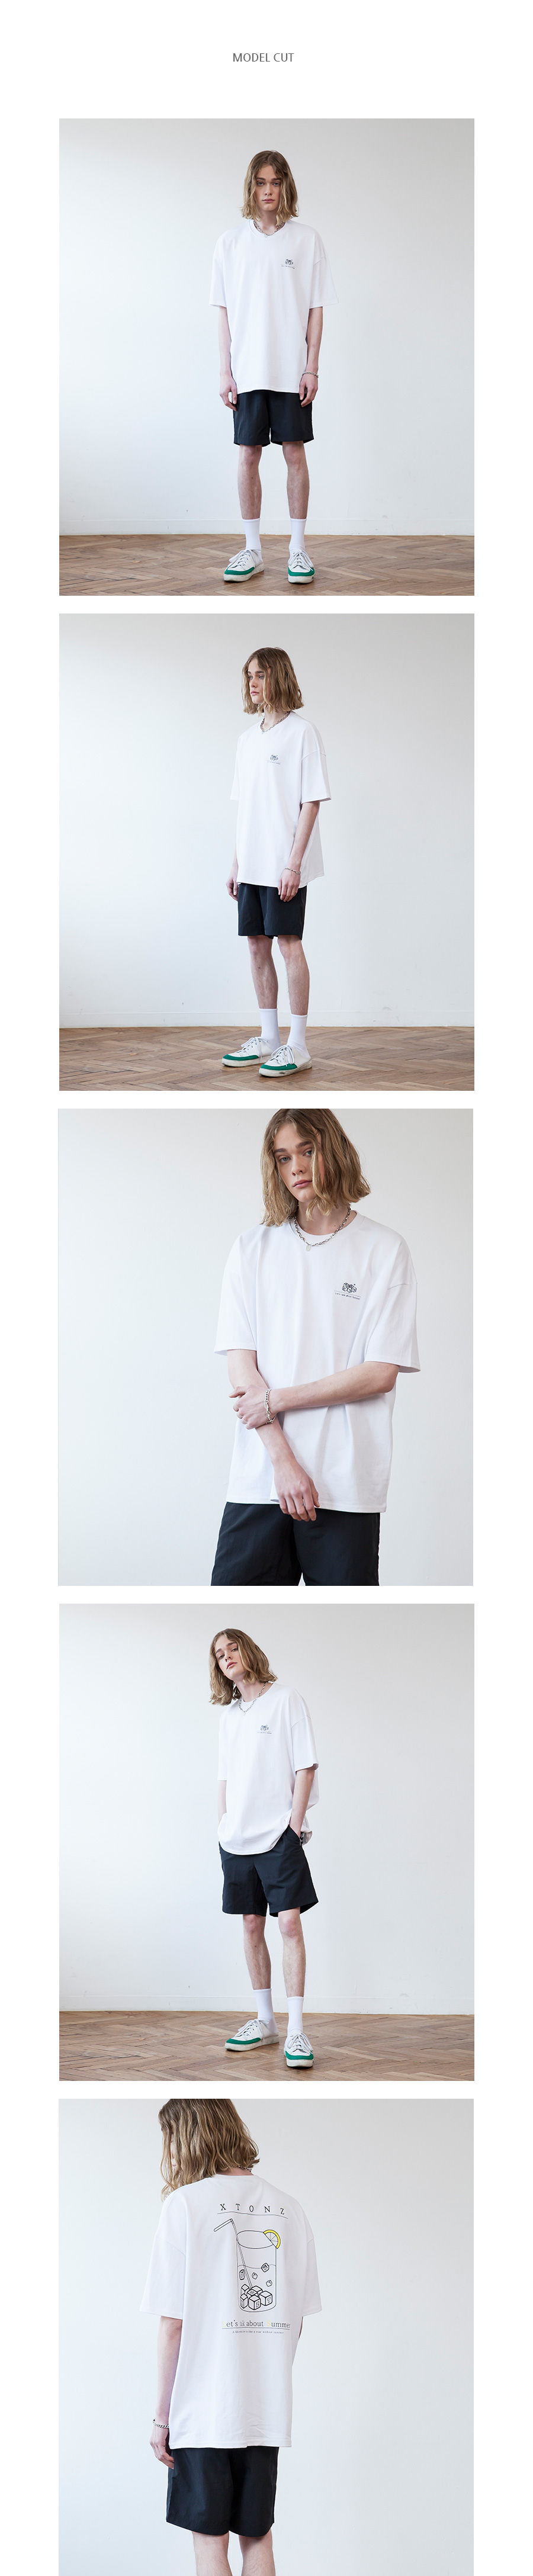 XTT015 아이스 큐브 반팔 티셔츠 (WHITE)